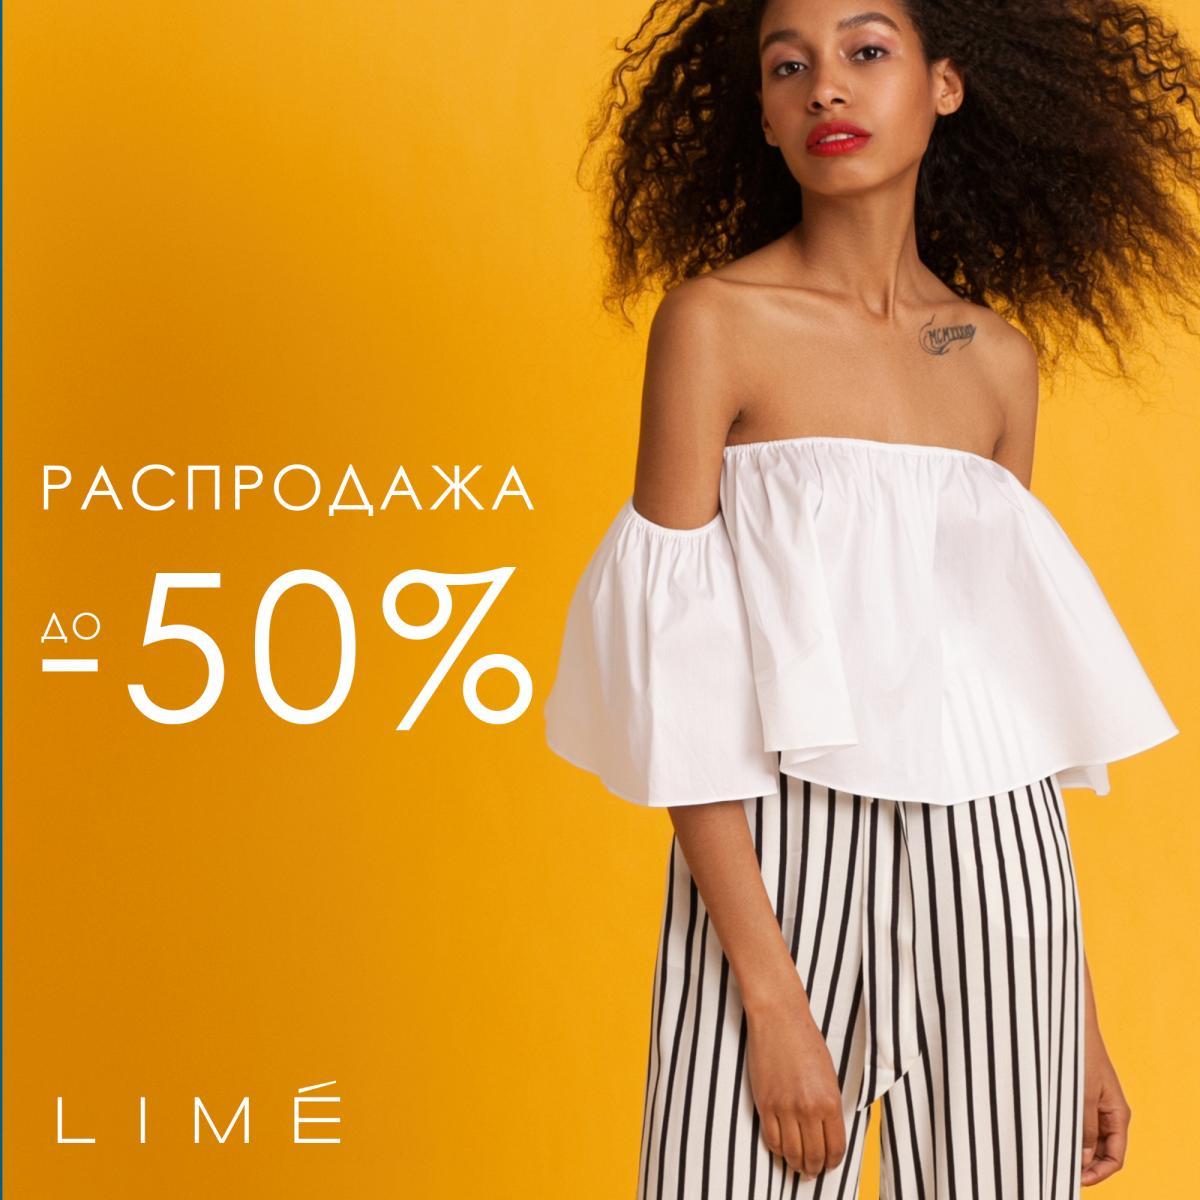 Lime Дисконт Интернет Магазин